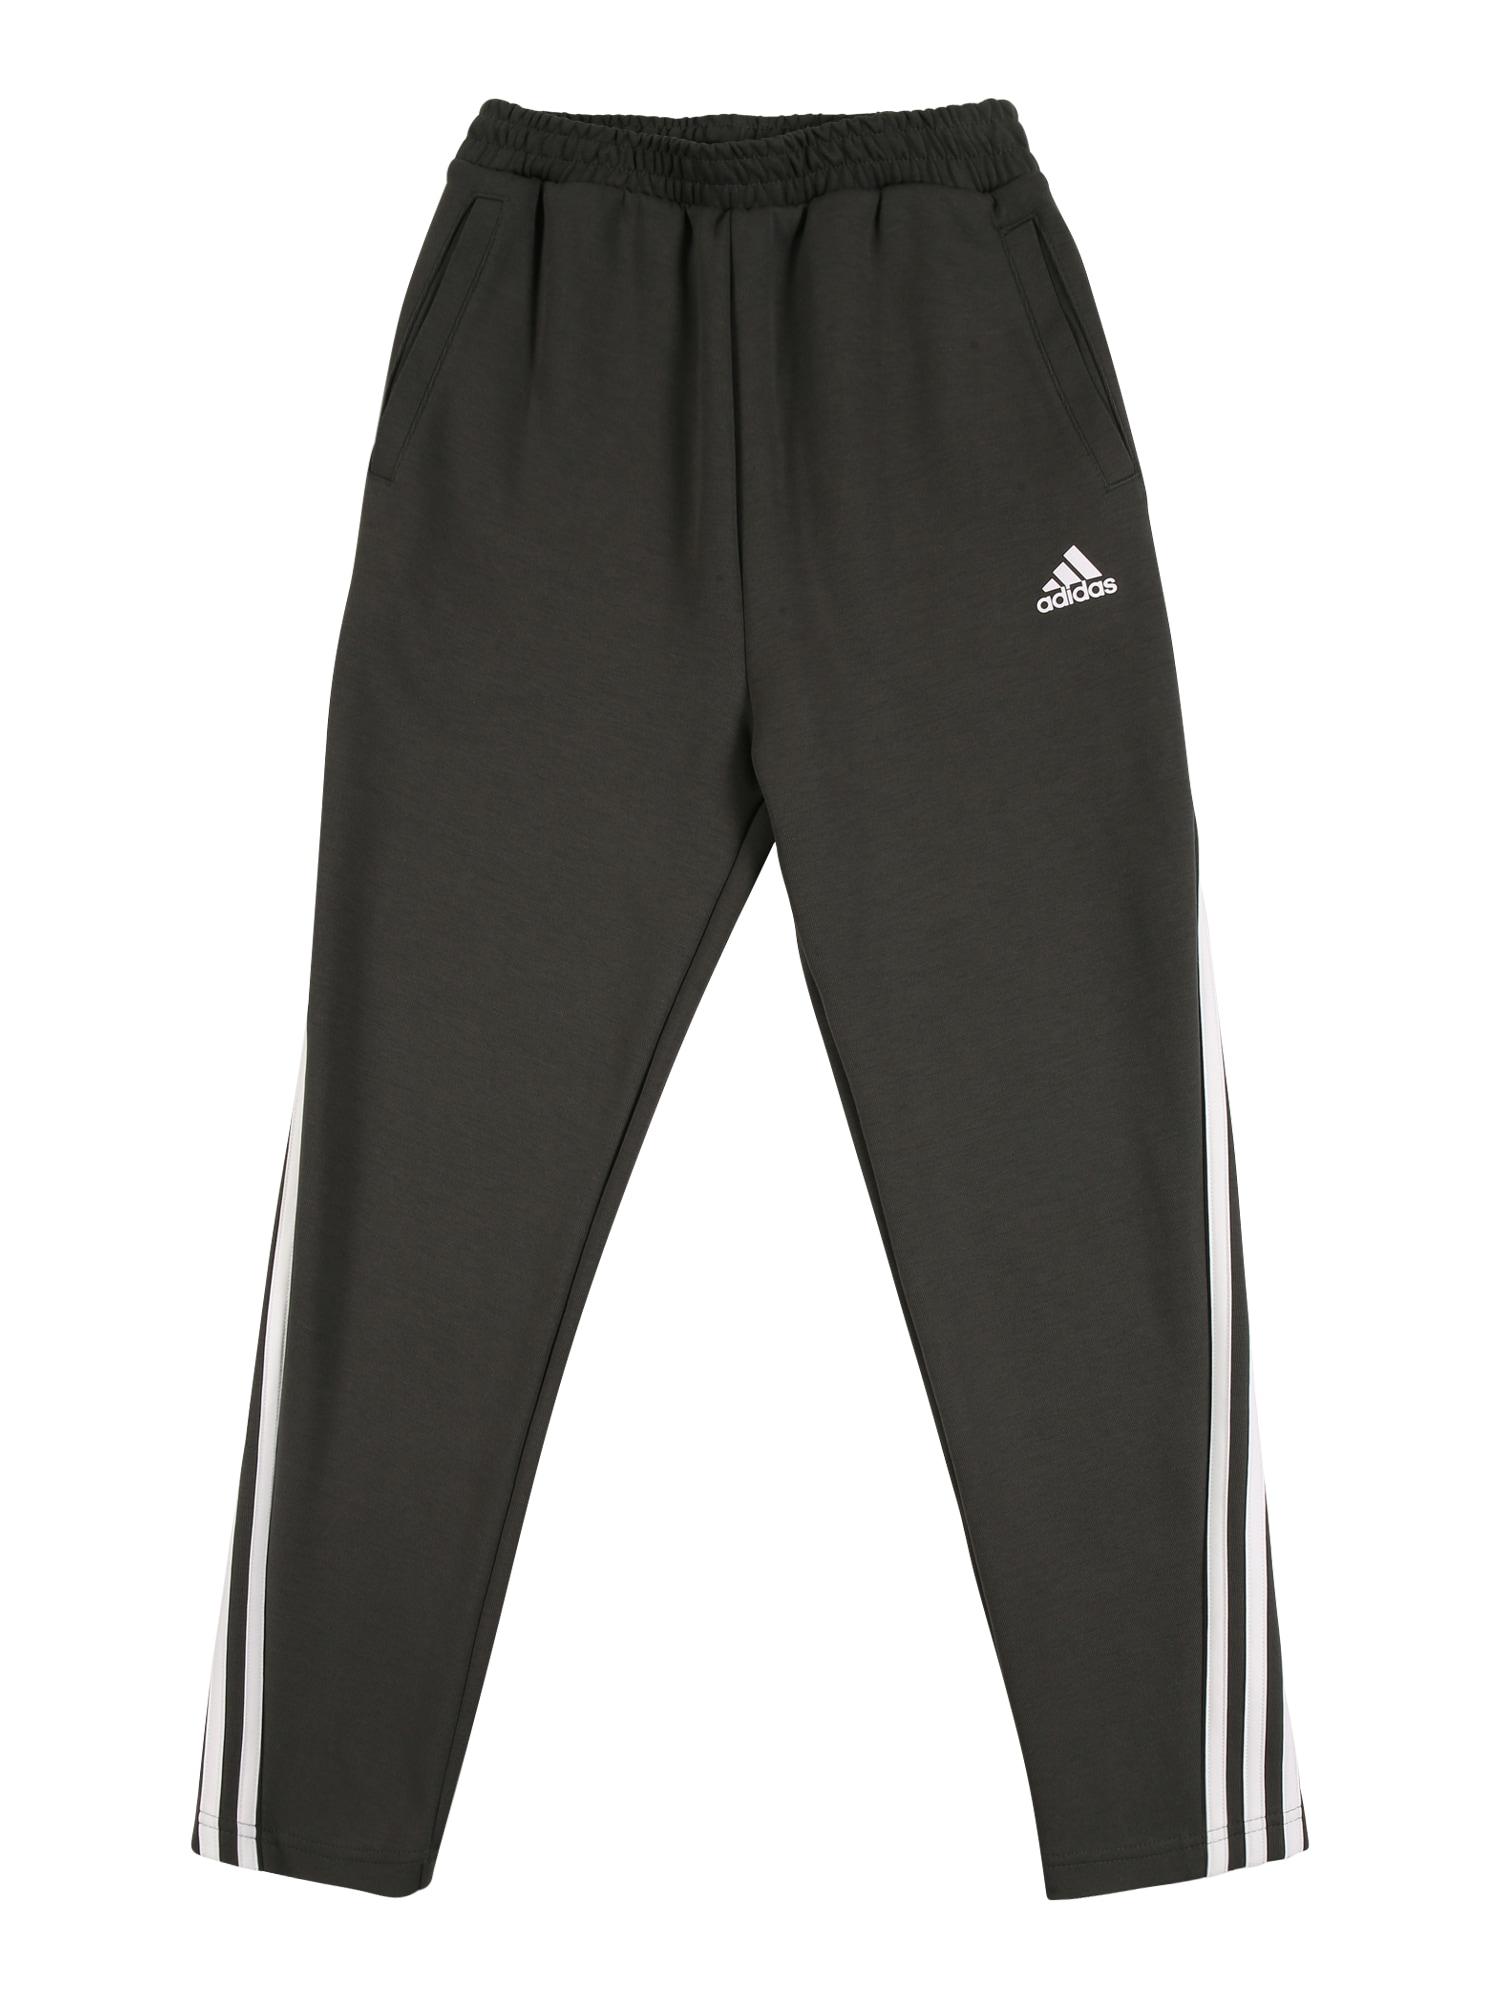 ADIDAS PERFORMANCE Sportovní kalhoty  černý melír / bílá